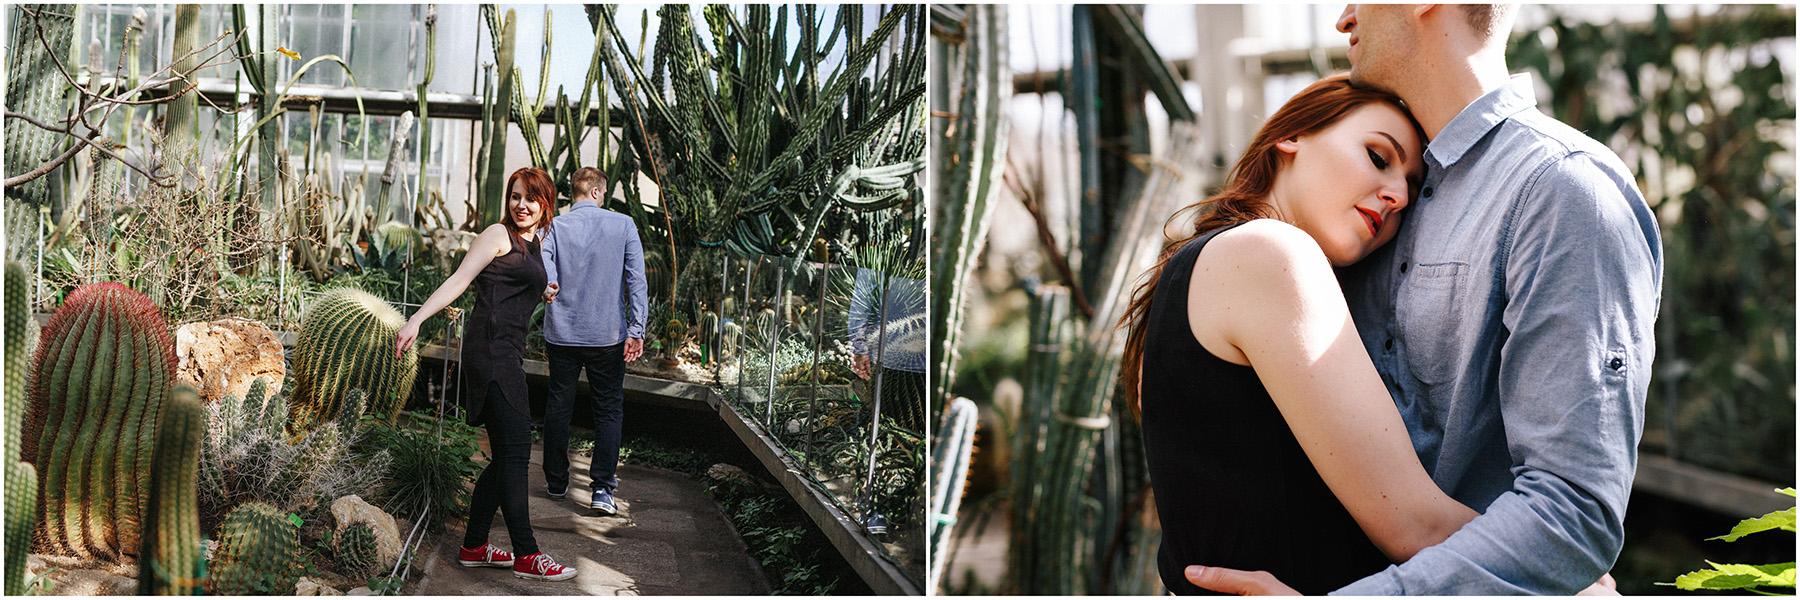 Monika & Damian | sesja w palmiarni 6